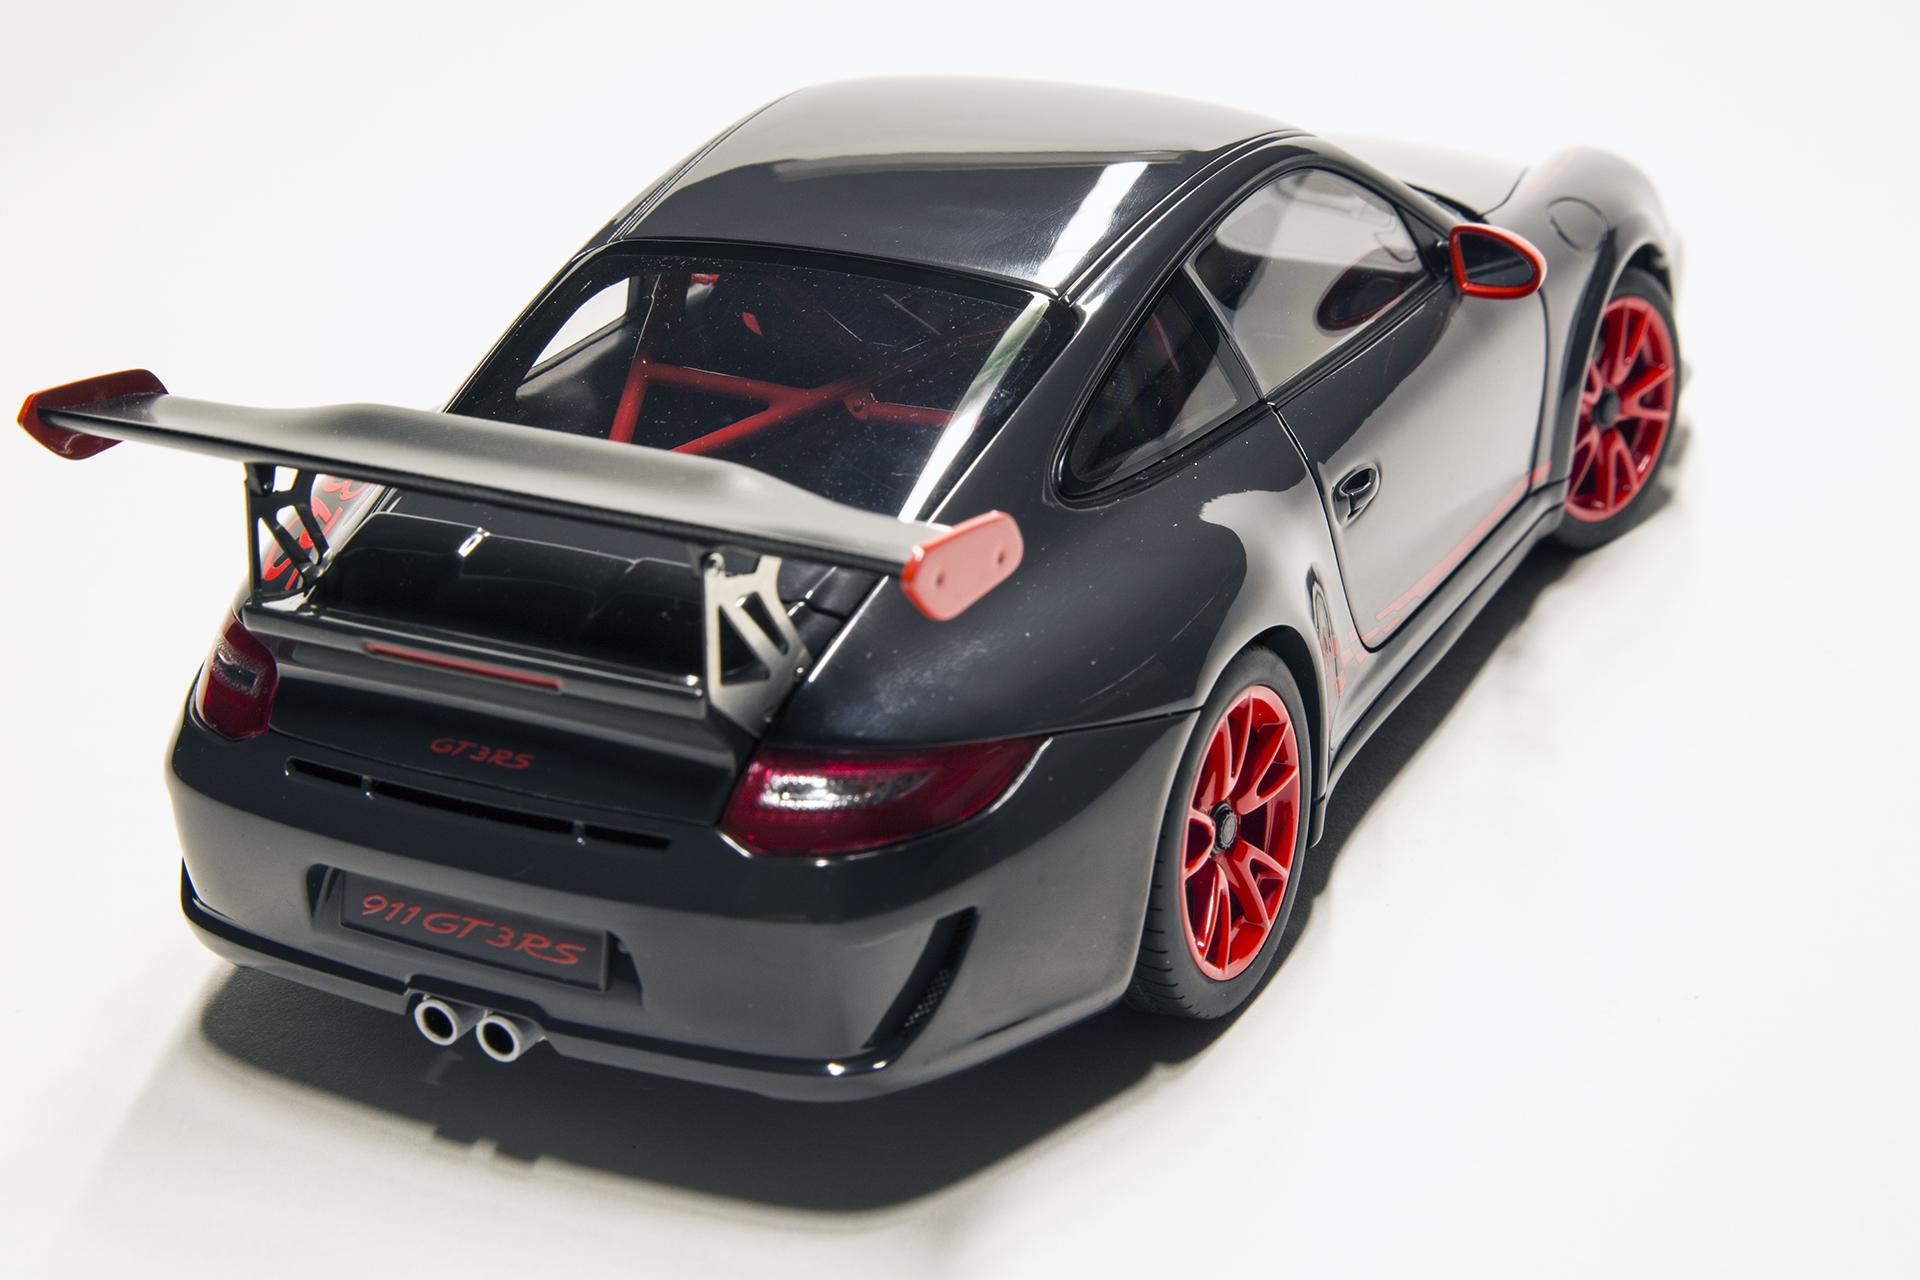 18diecast com | 1:18 Scale Diecast Model Cars » Porsche 911 GT3 RS